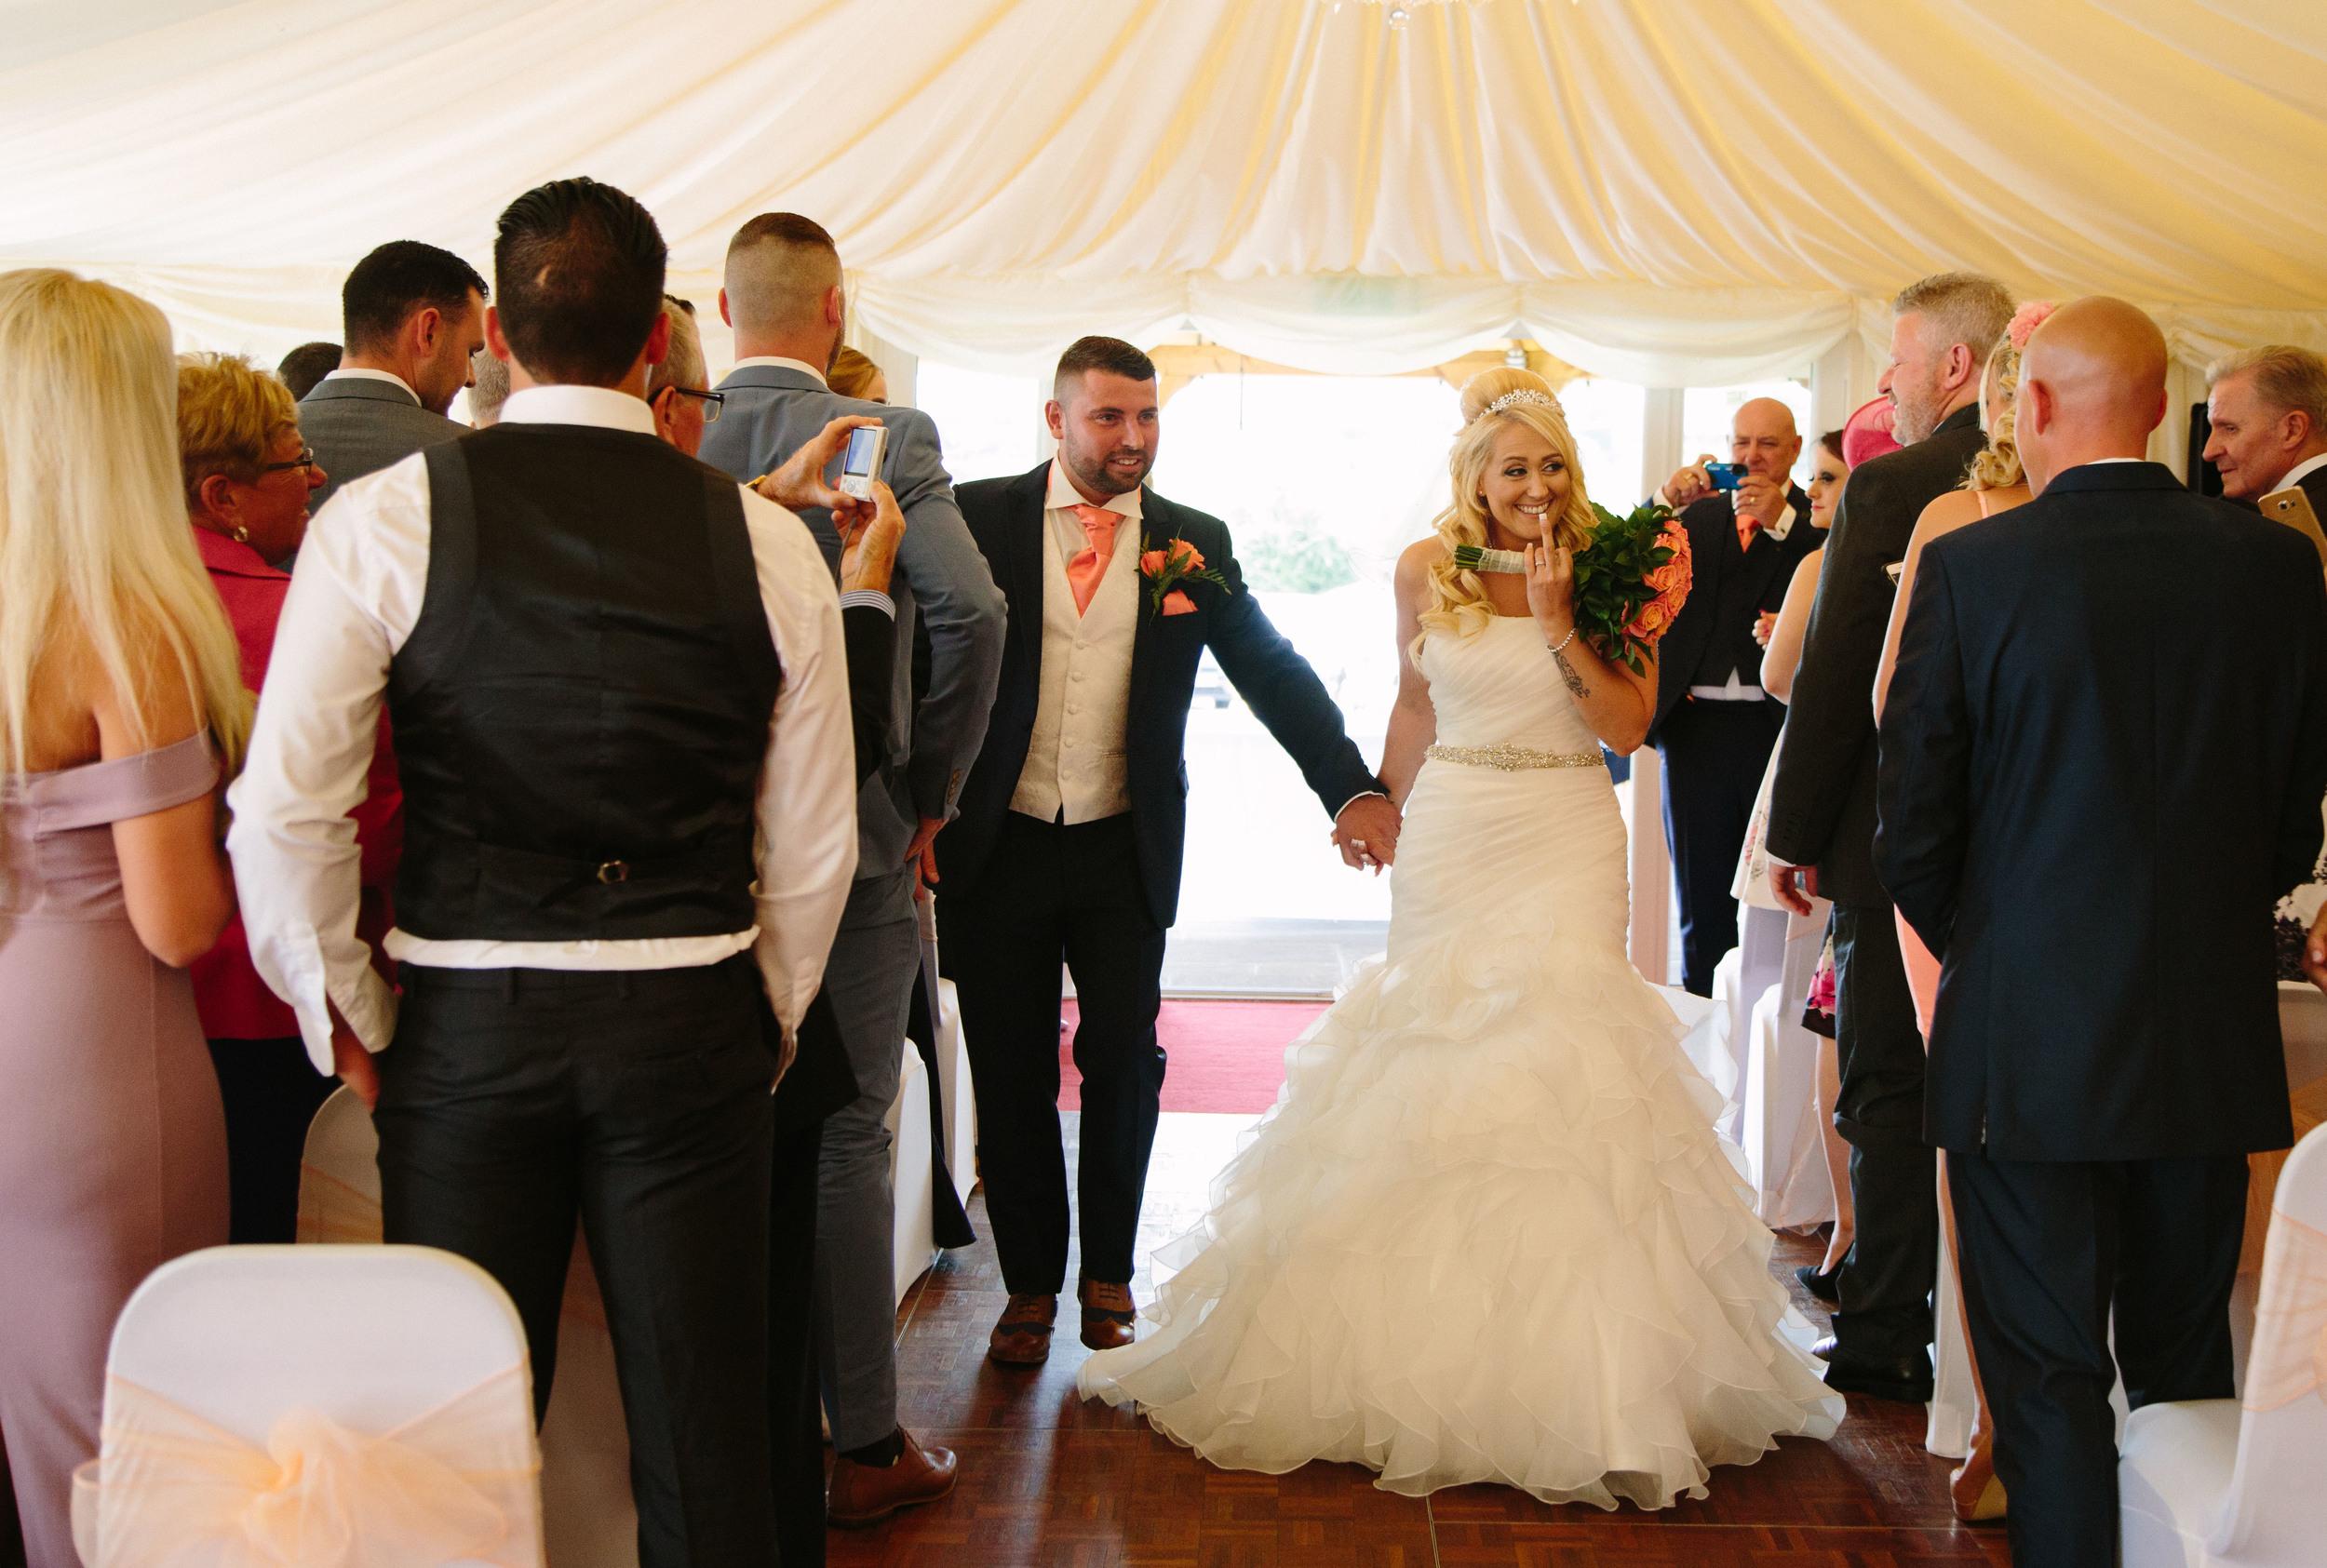 Essex-countryside-wedding-summer-down-the-aisl